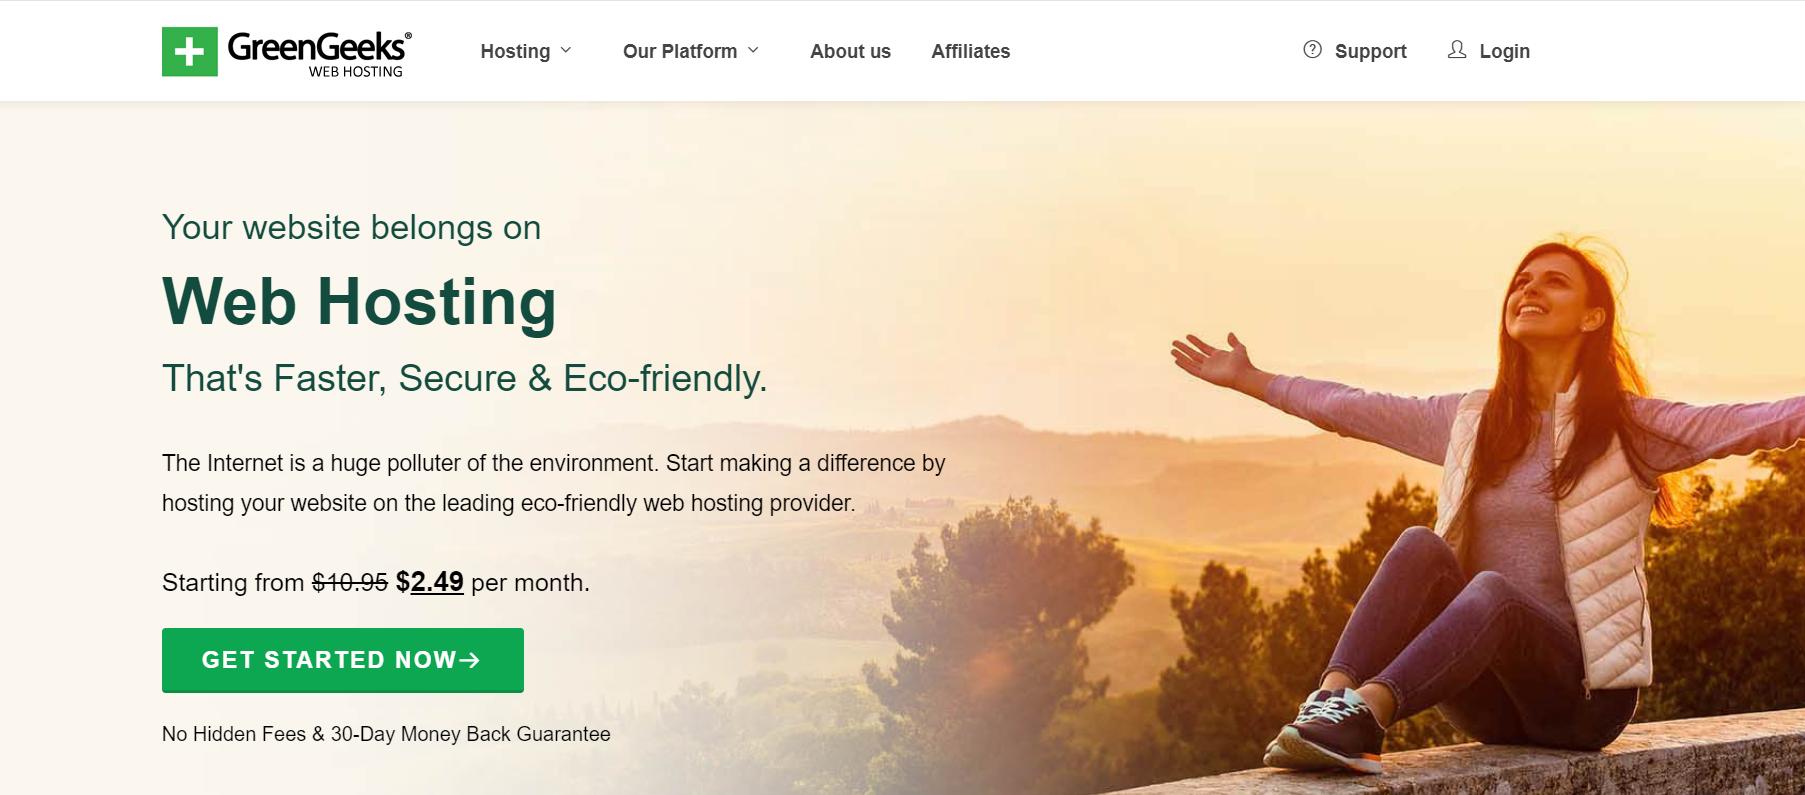 greengeeks web hosting - digitally atanu